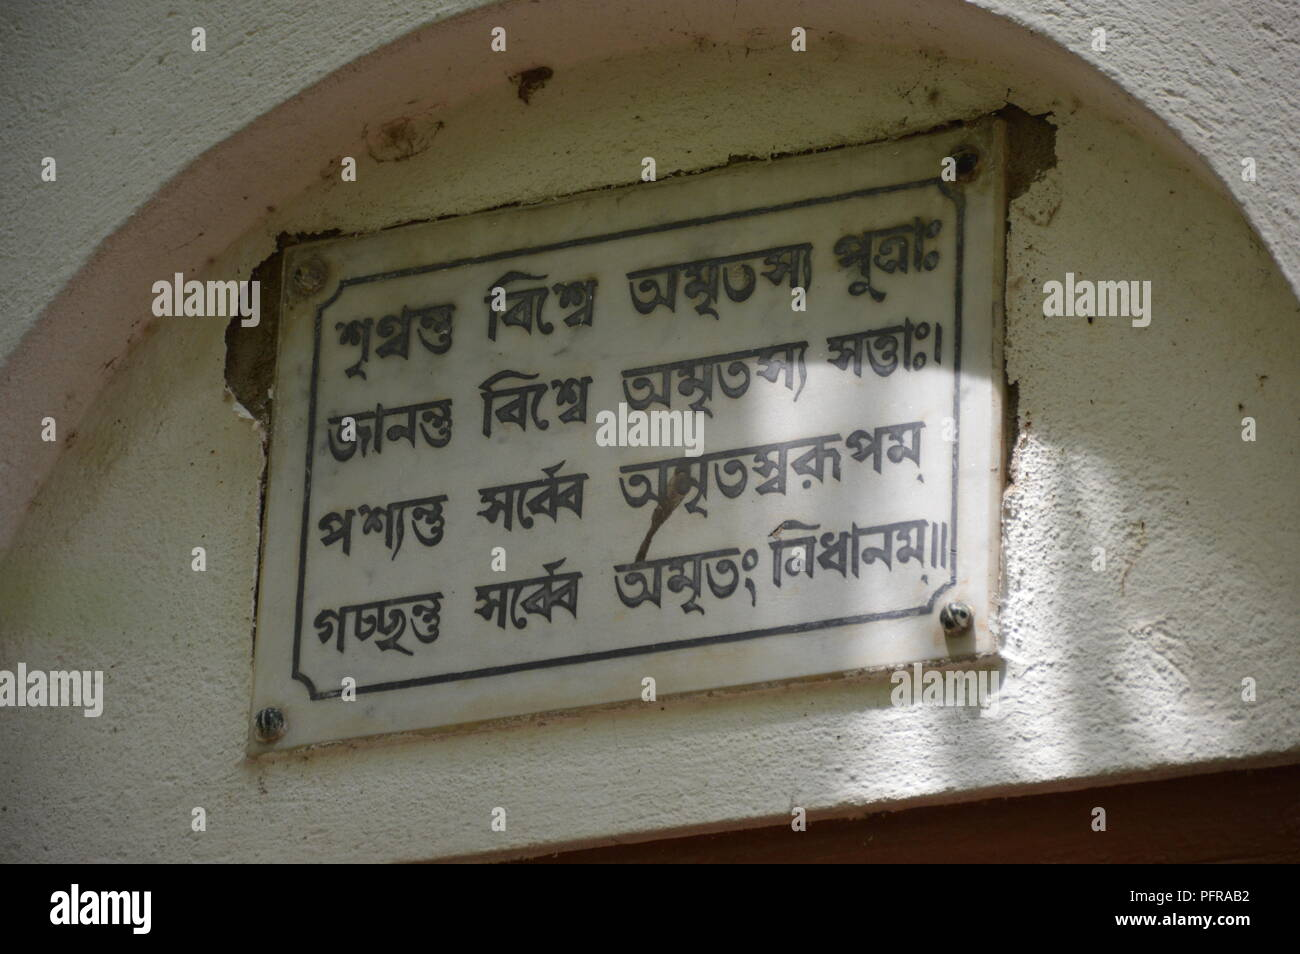 Sanskrit quotation from Gita in Bengali script of the Ganga Teer, 10 Joy Narayan Babu and Ananda Dutta lane in Howrah district, West Bengal, India - Stock Image